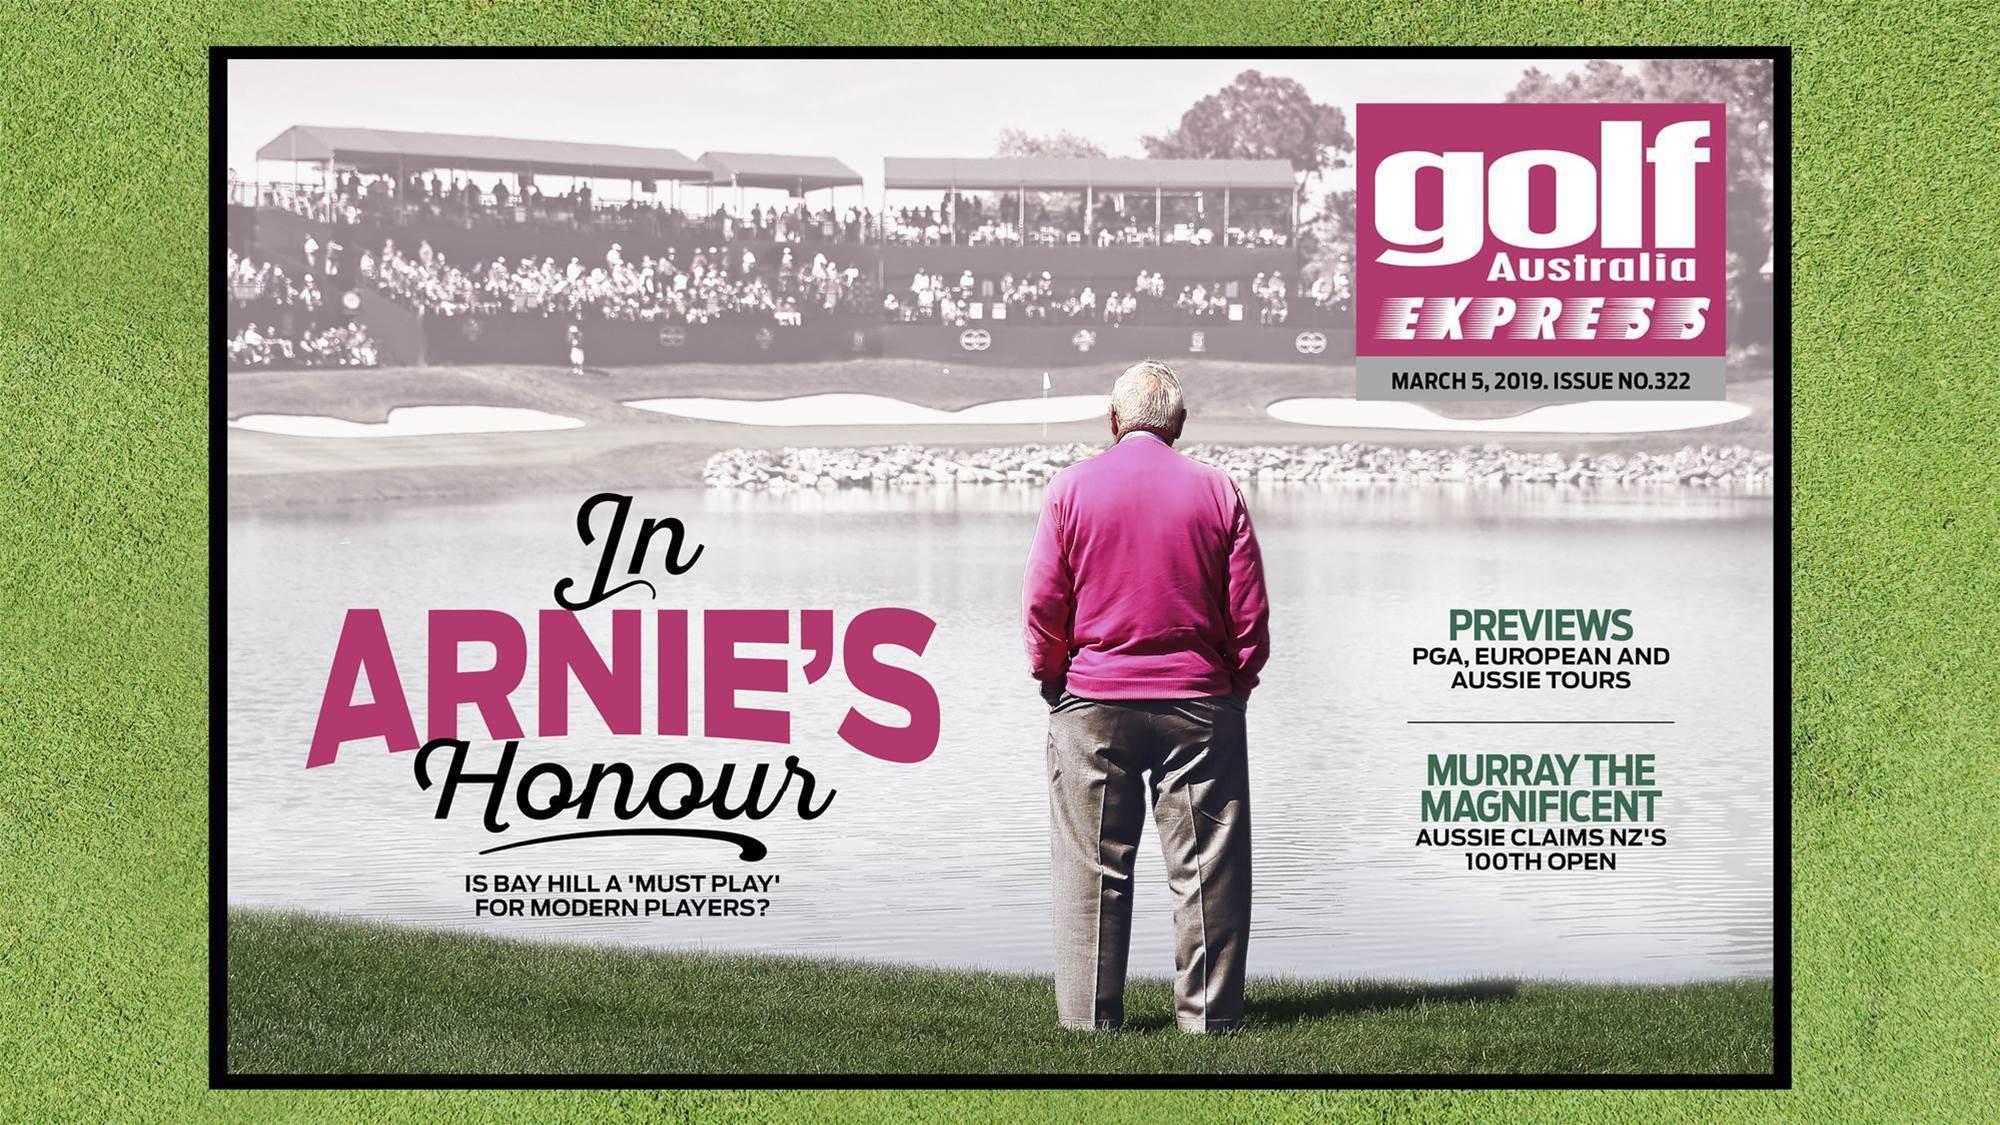 GA Express 322: In Arnie's Honour